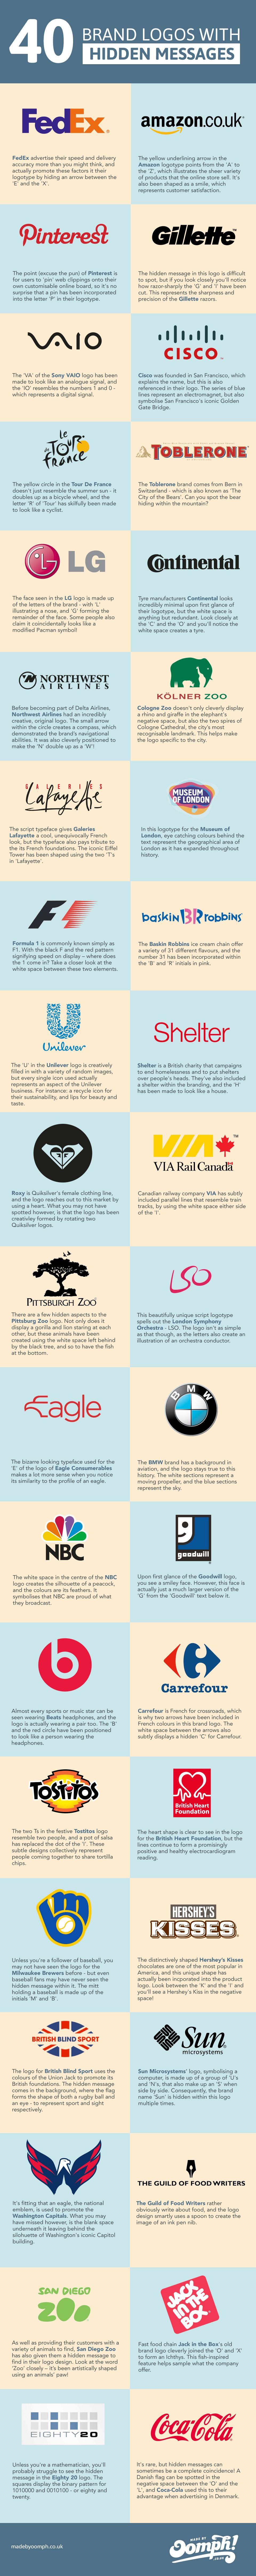 logos-oomph-infographie Infographie : 40 logos contenant des messages cachés